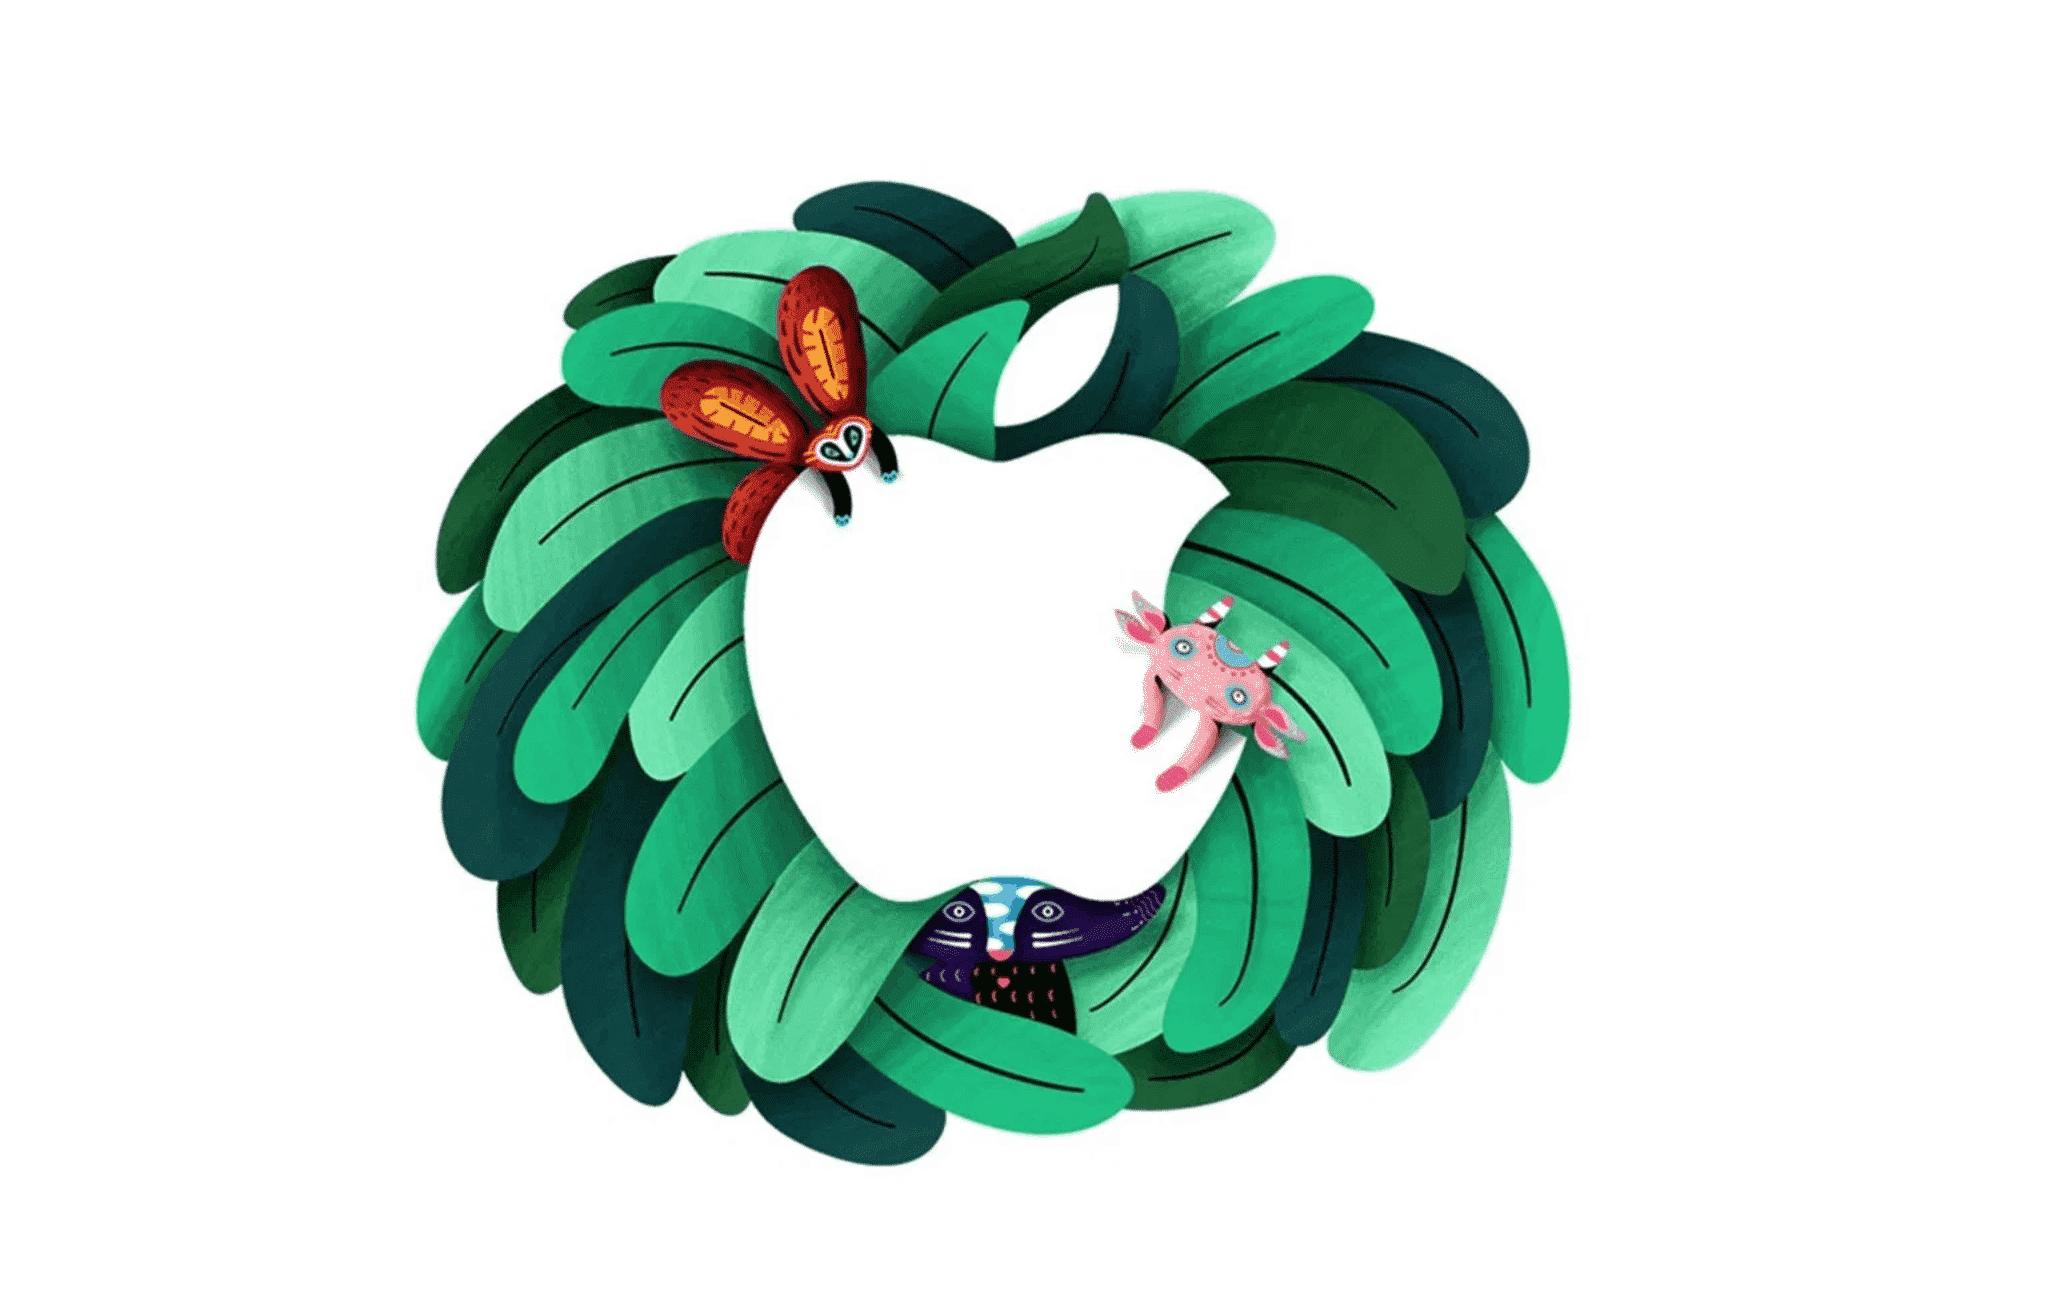 Apple Antara in Mexico Set to Open September 27